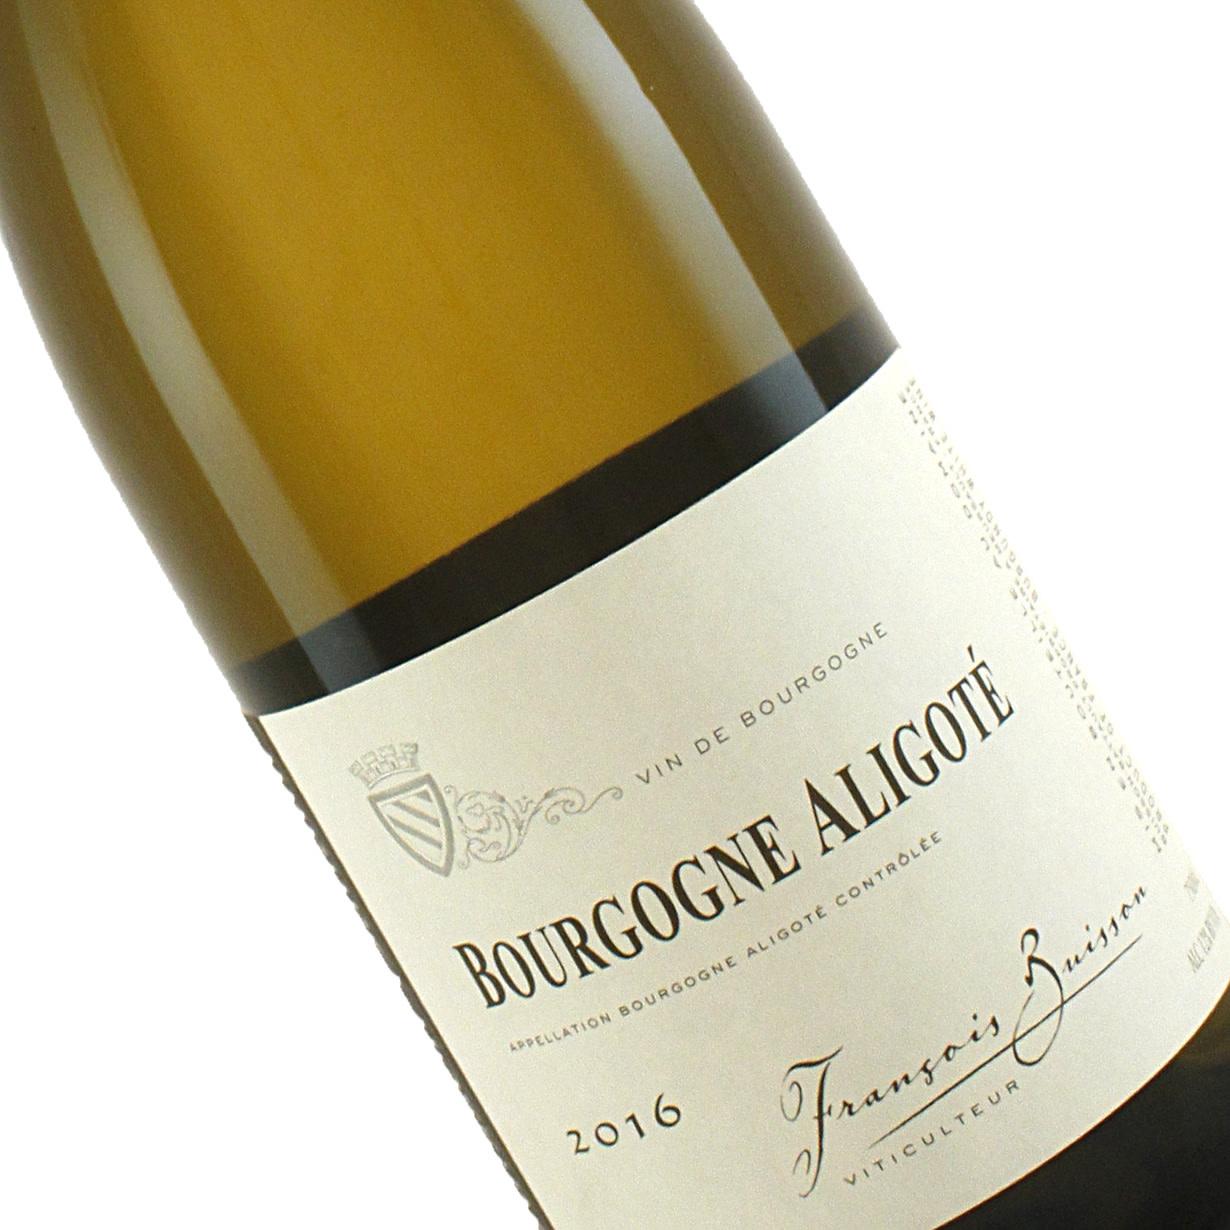 Domaine Buisson Battault 2016 Aligote, Burgundy